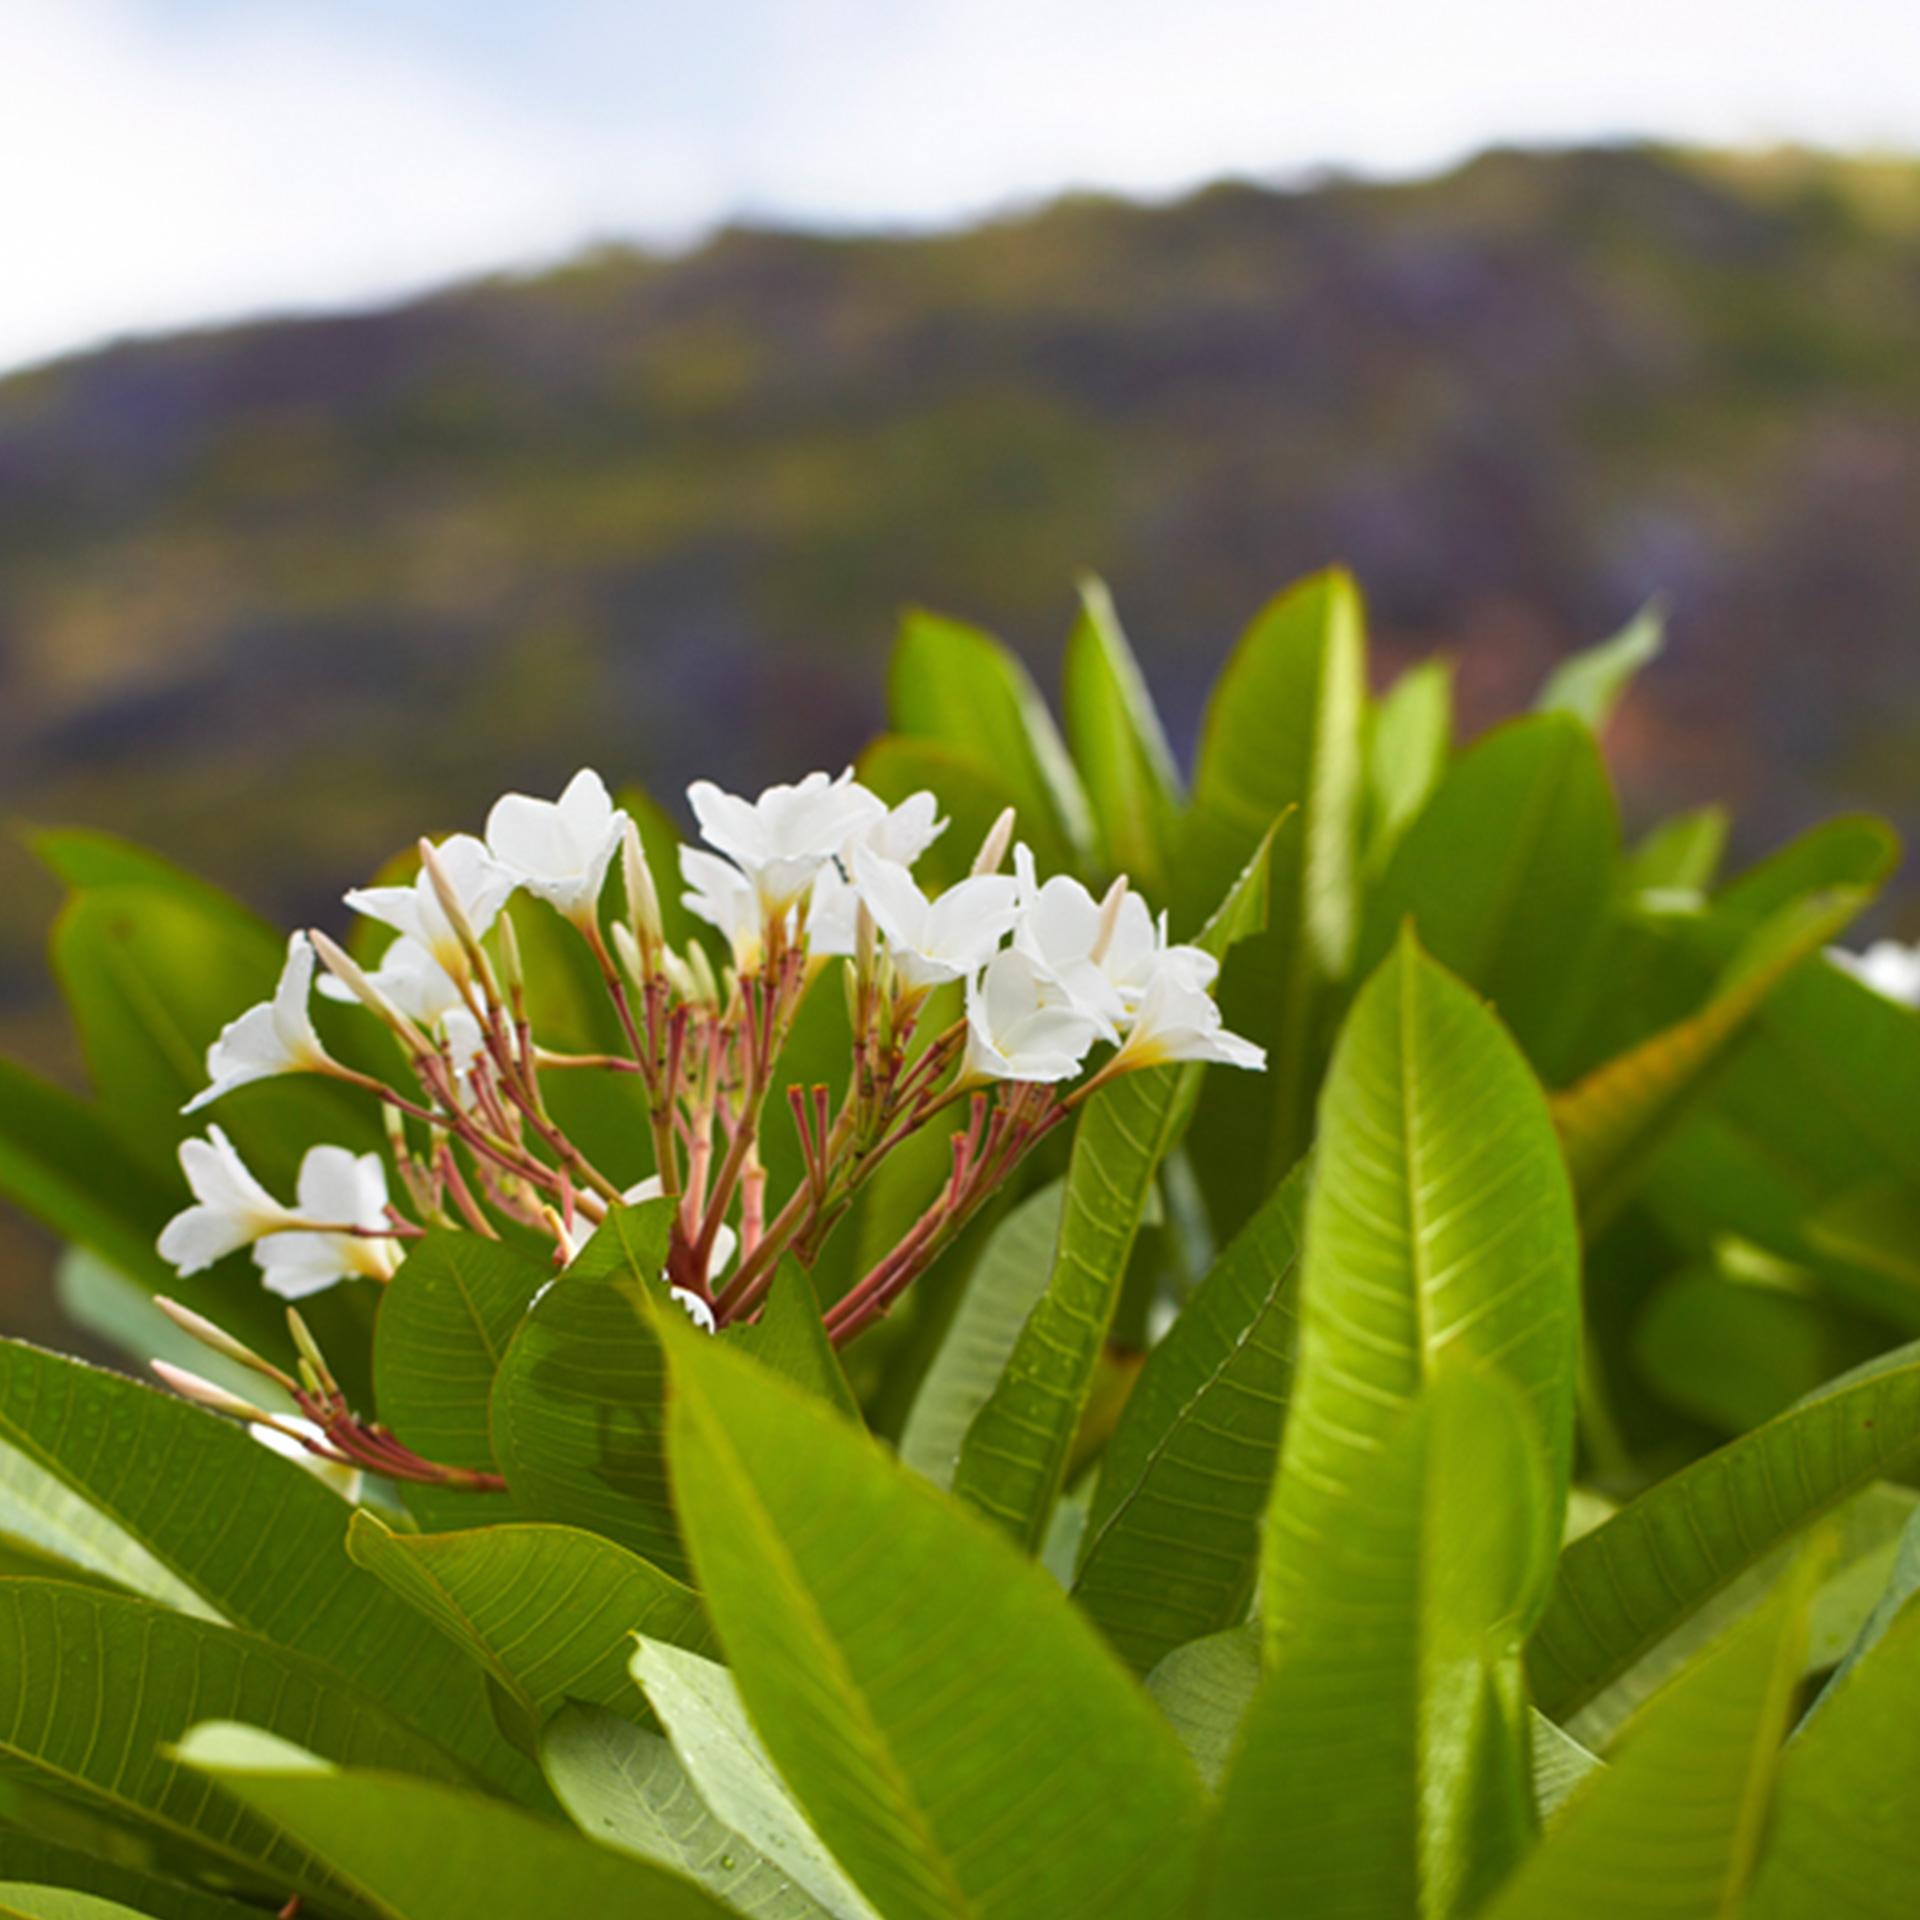 Luxury Real Estate PPC | Sugar Beach Residences | Native Flowers Closeup